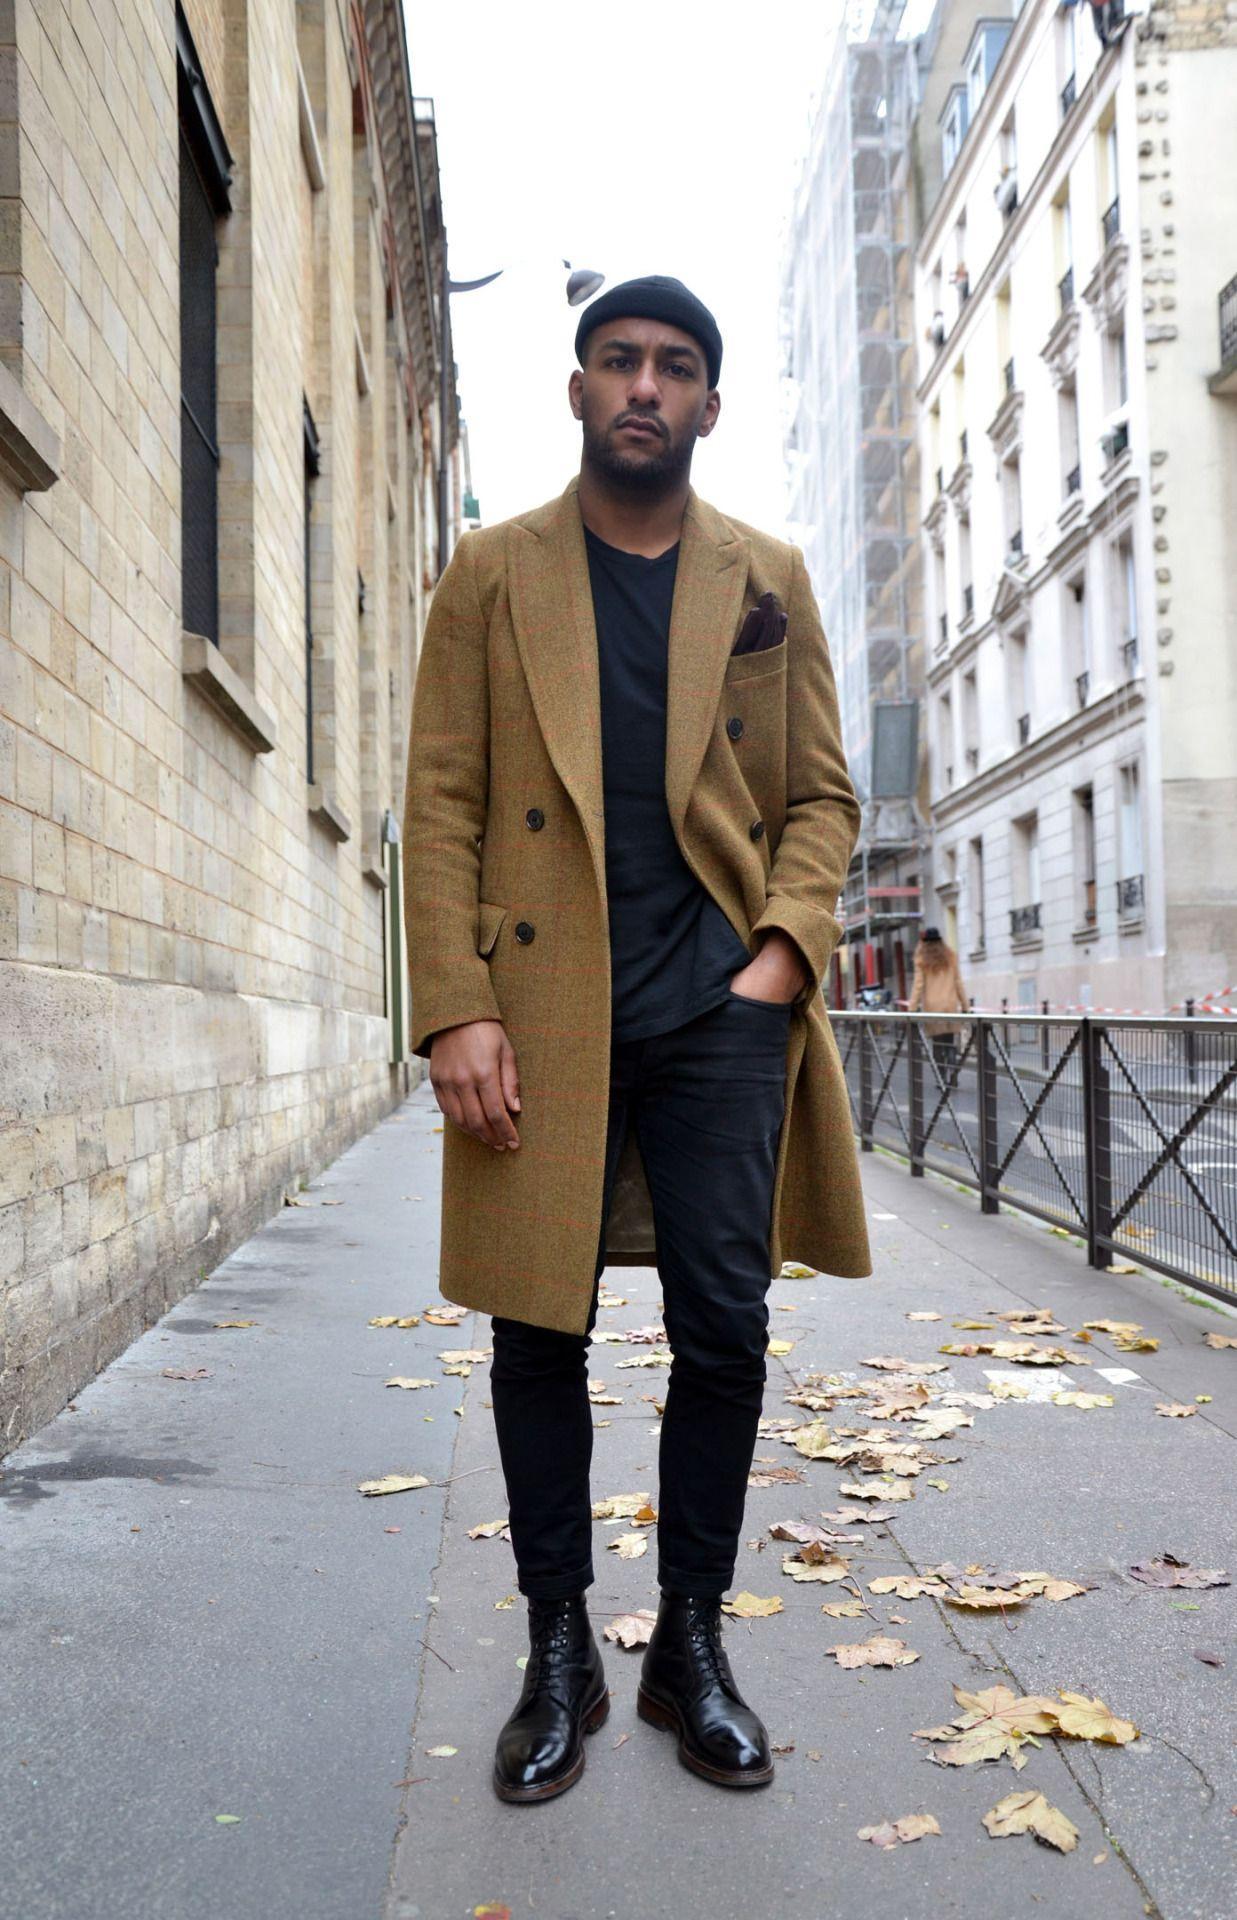 Refined Edge Menswear Mens Style Fashion Beanie Knit Hat Boots Camel Coat Topcoat Tan